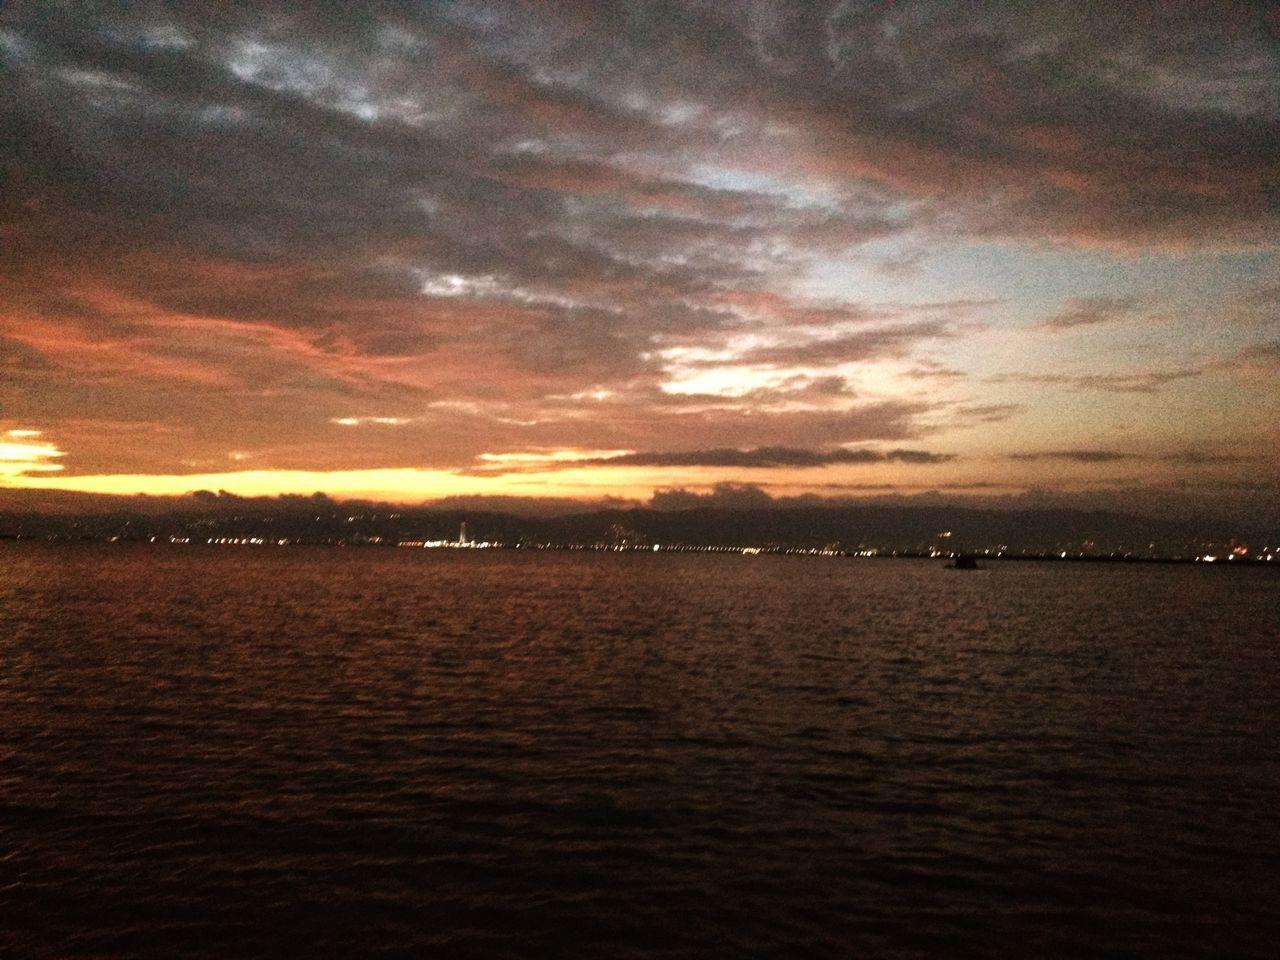 Cebu City as seen from Cordova, Mactan Island (The Philippines)